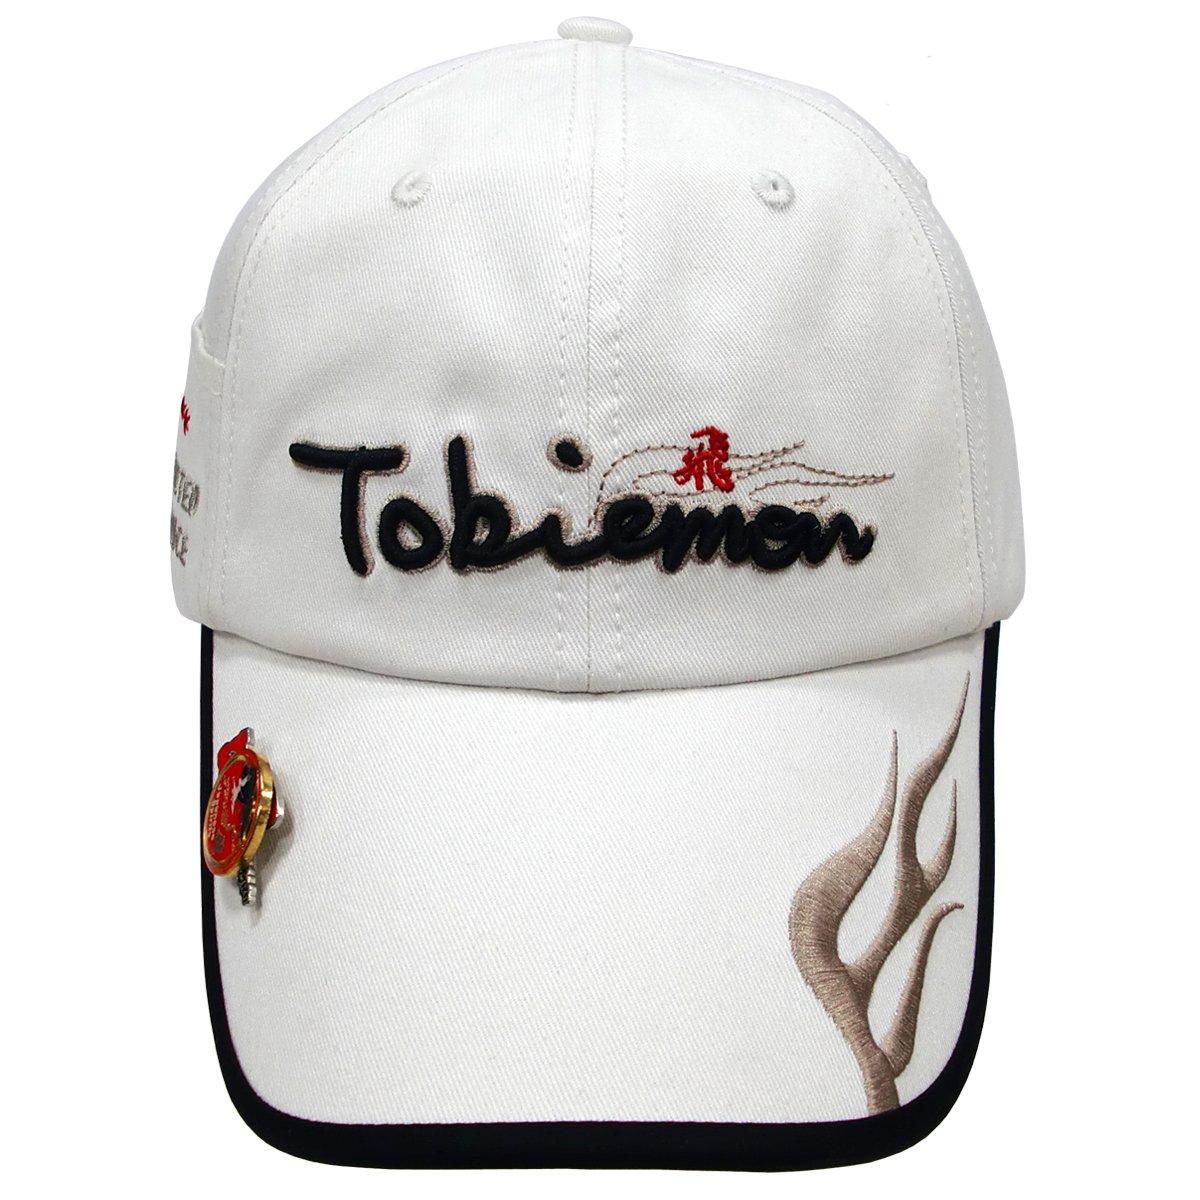 MU Sports Super Cap with Gold Cap Marker White Tbmc - WH Golf Wear/Women's Vest/Women's Complete Sets/Golf-Club-Complete-Sets